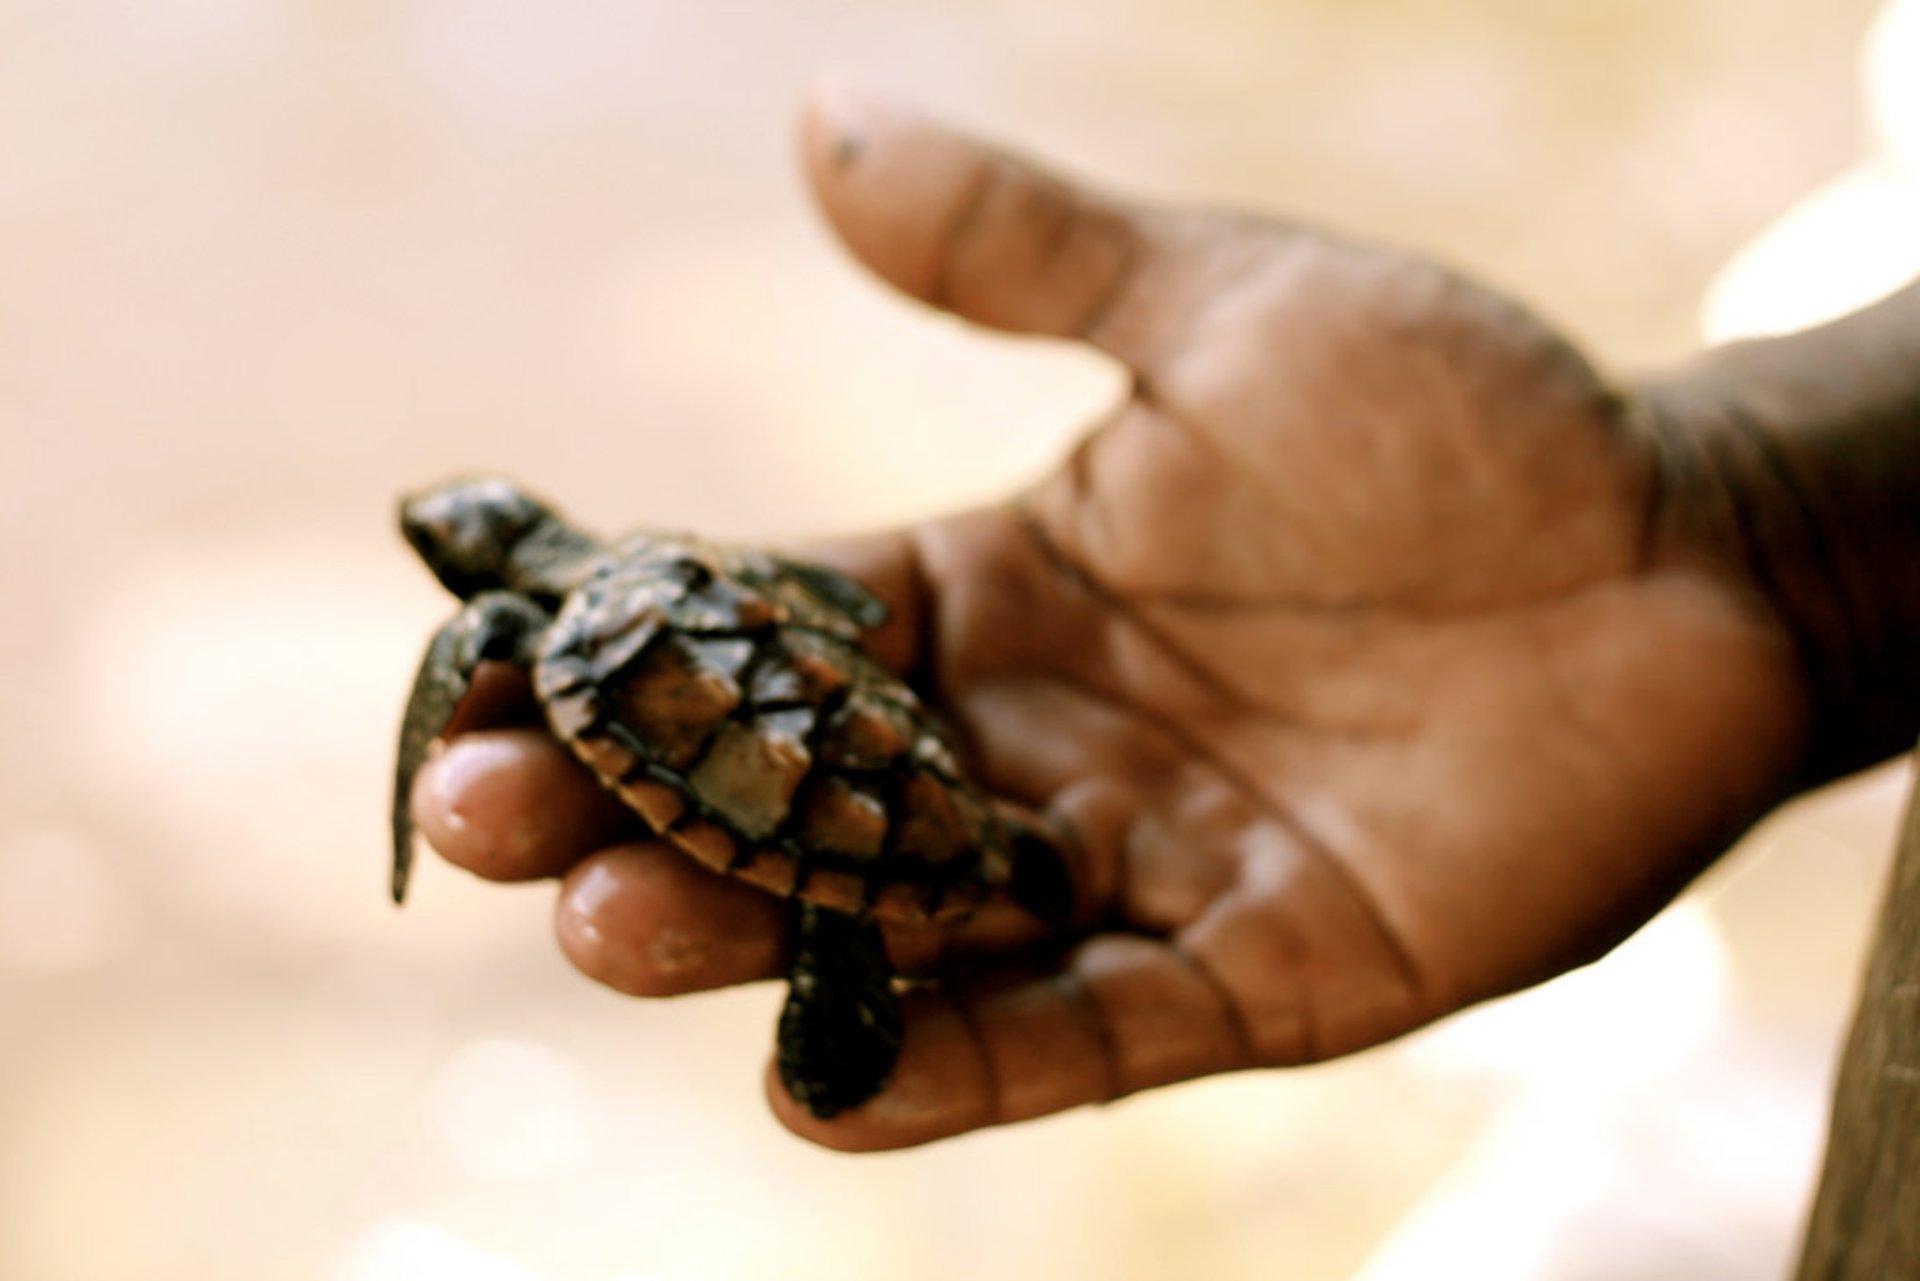 Marine Turtle Nesting Season in Zanzibar 2020 - Best Time